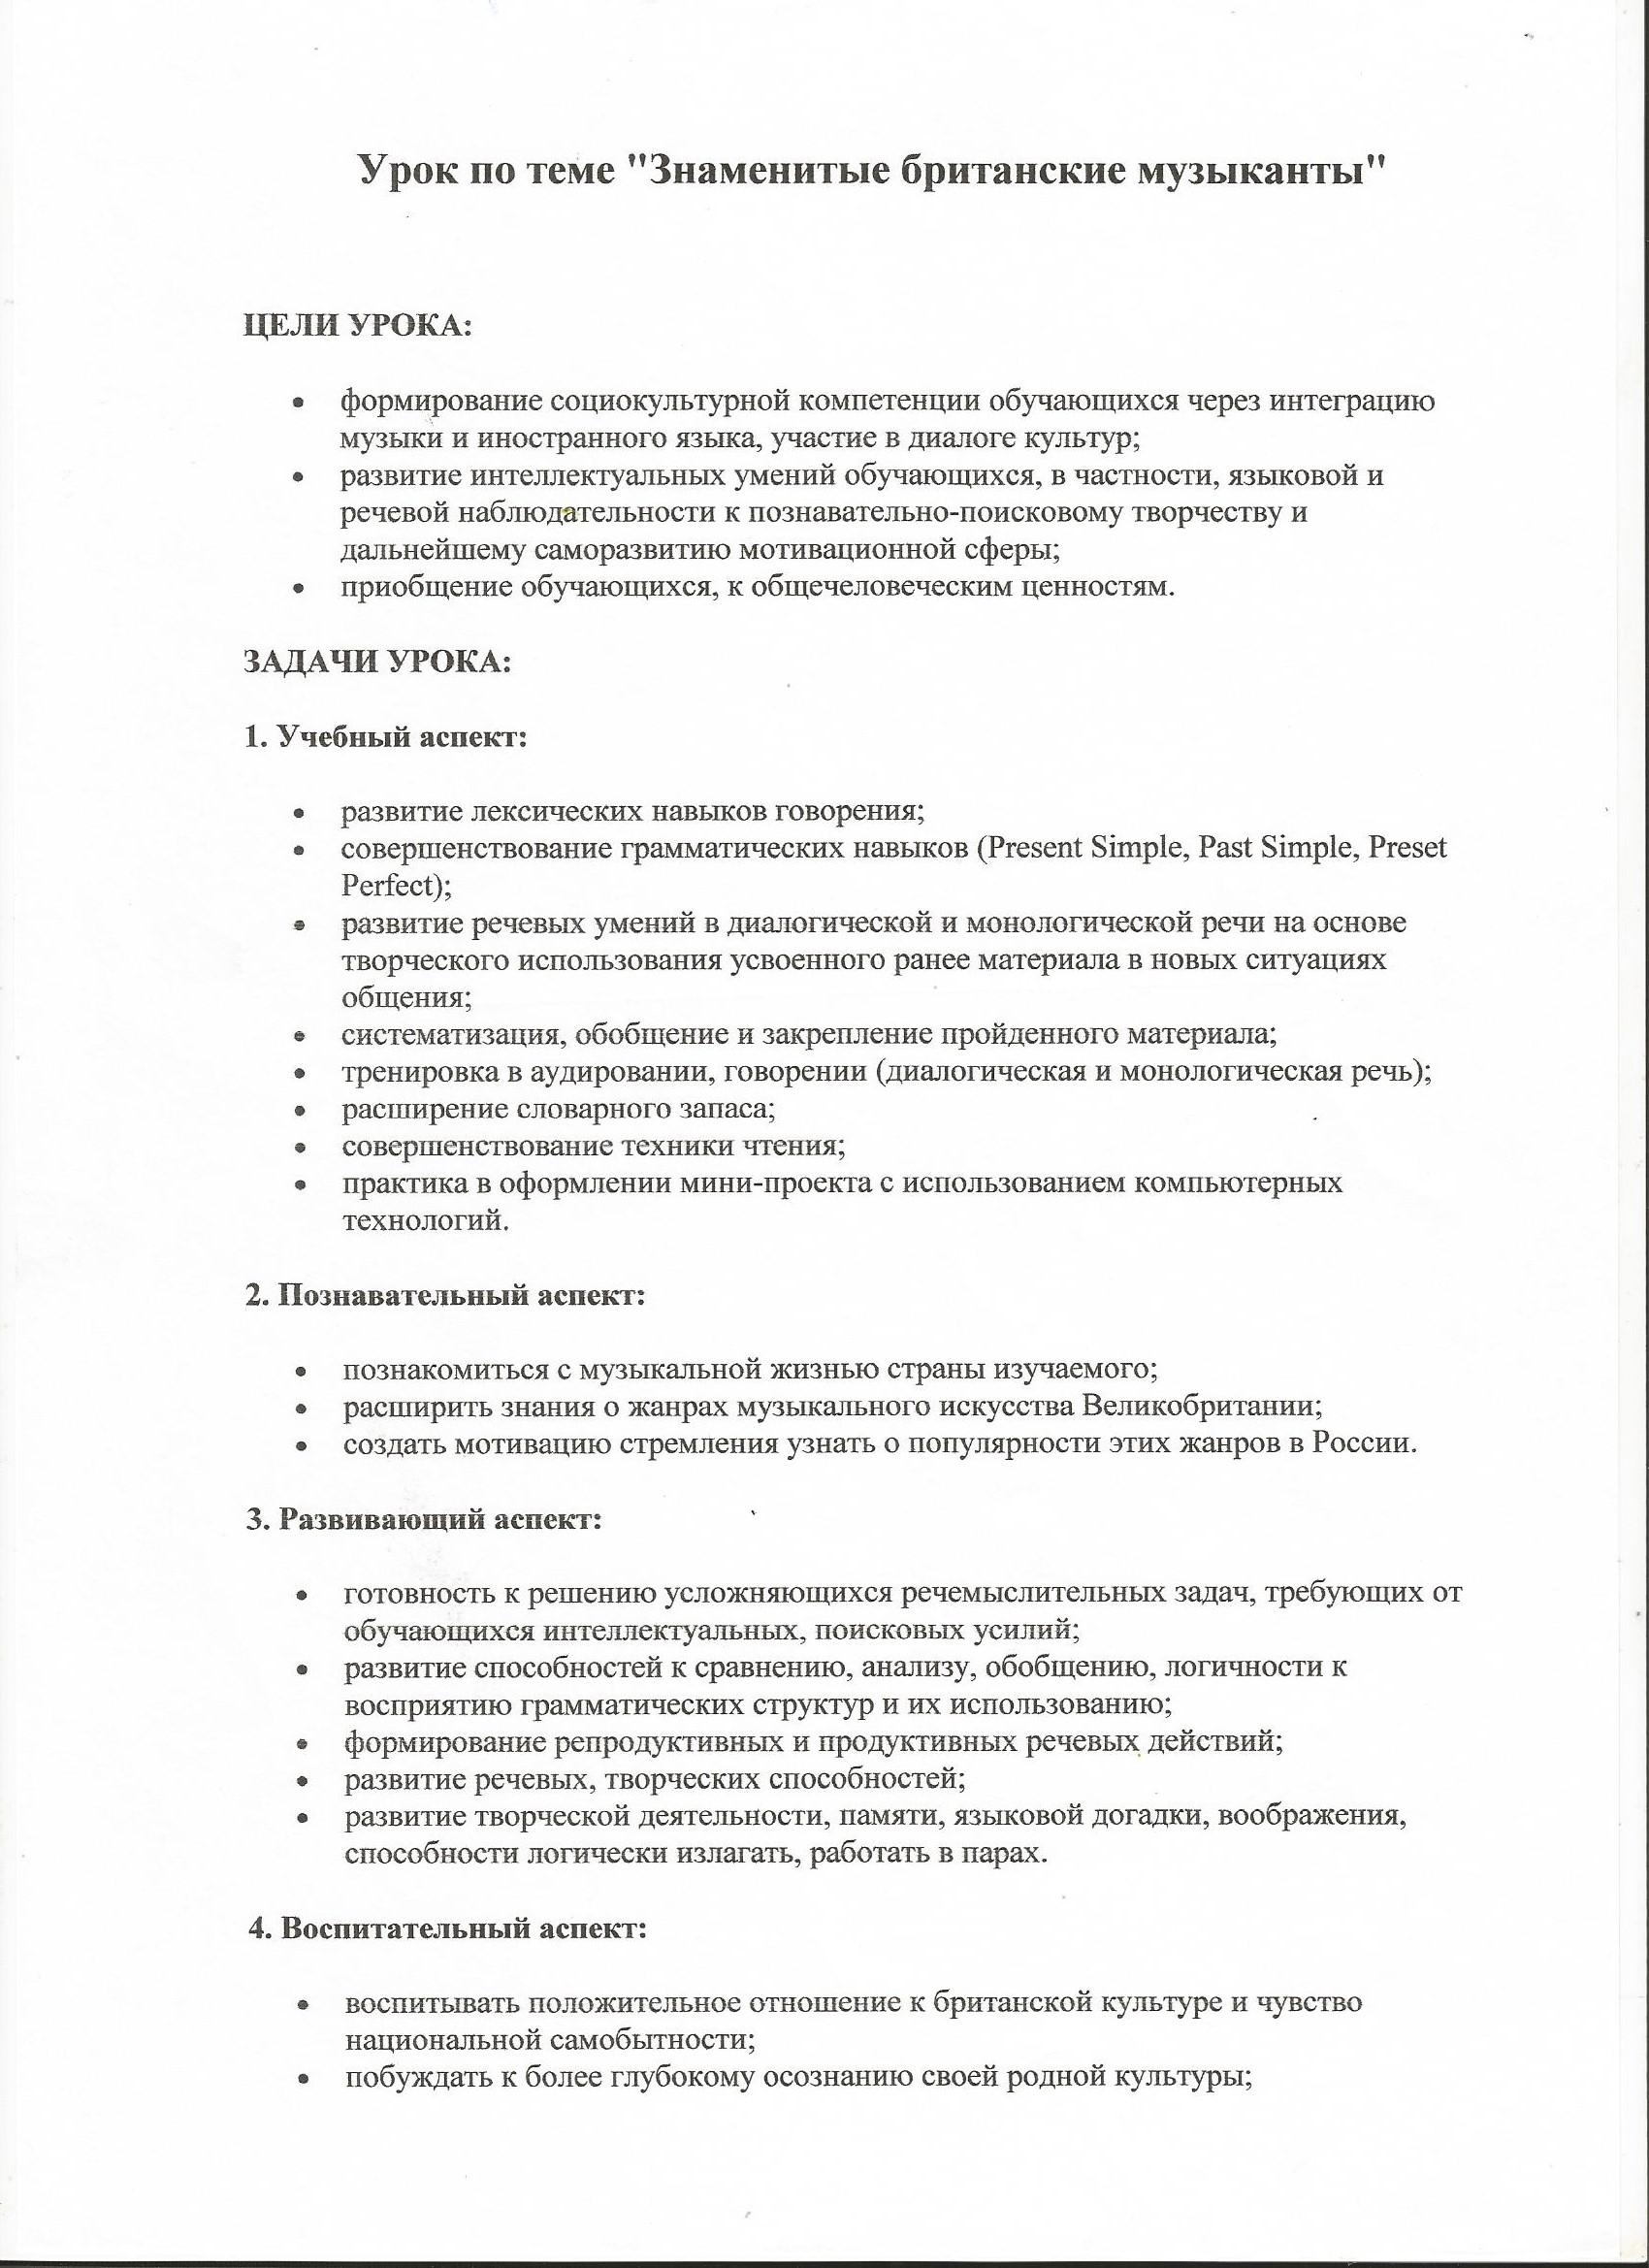 C:\Users\Ольга Васильевна\Documents\Scan0020.jpg